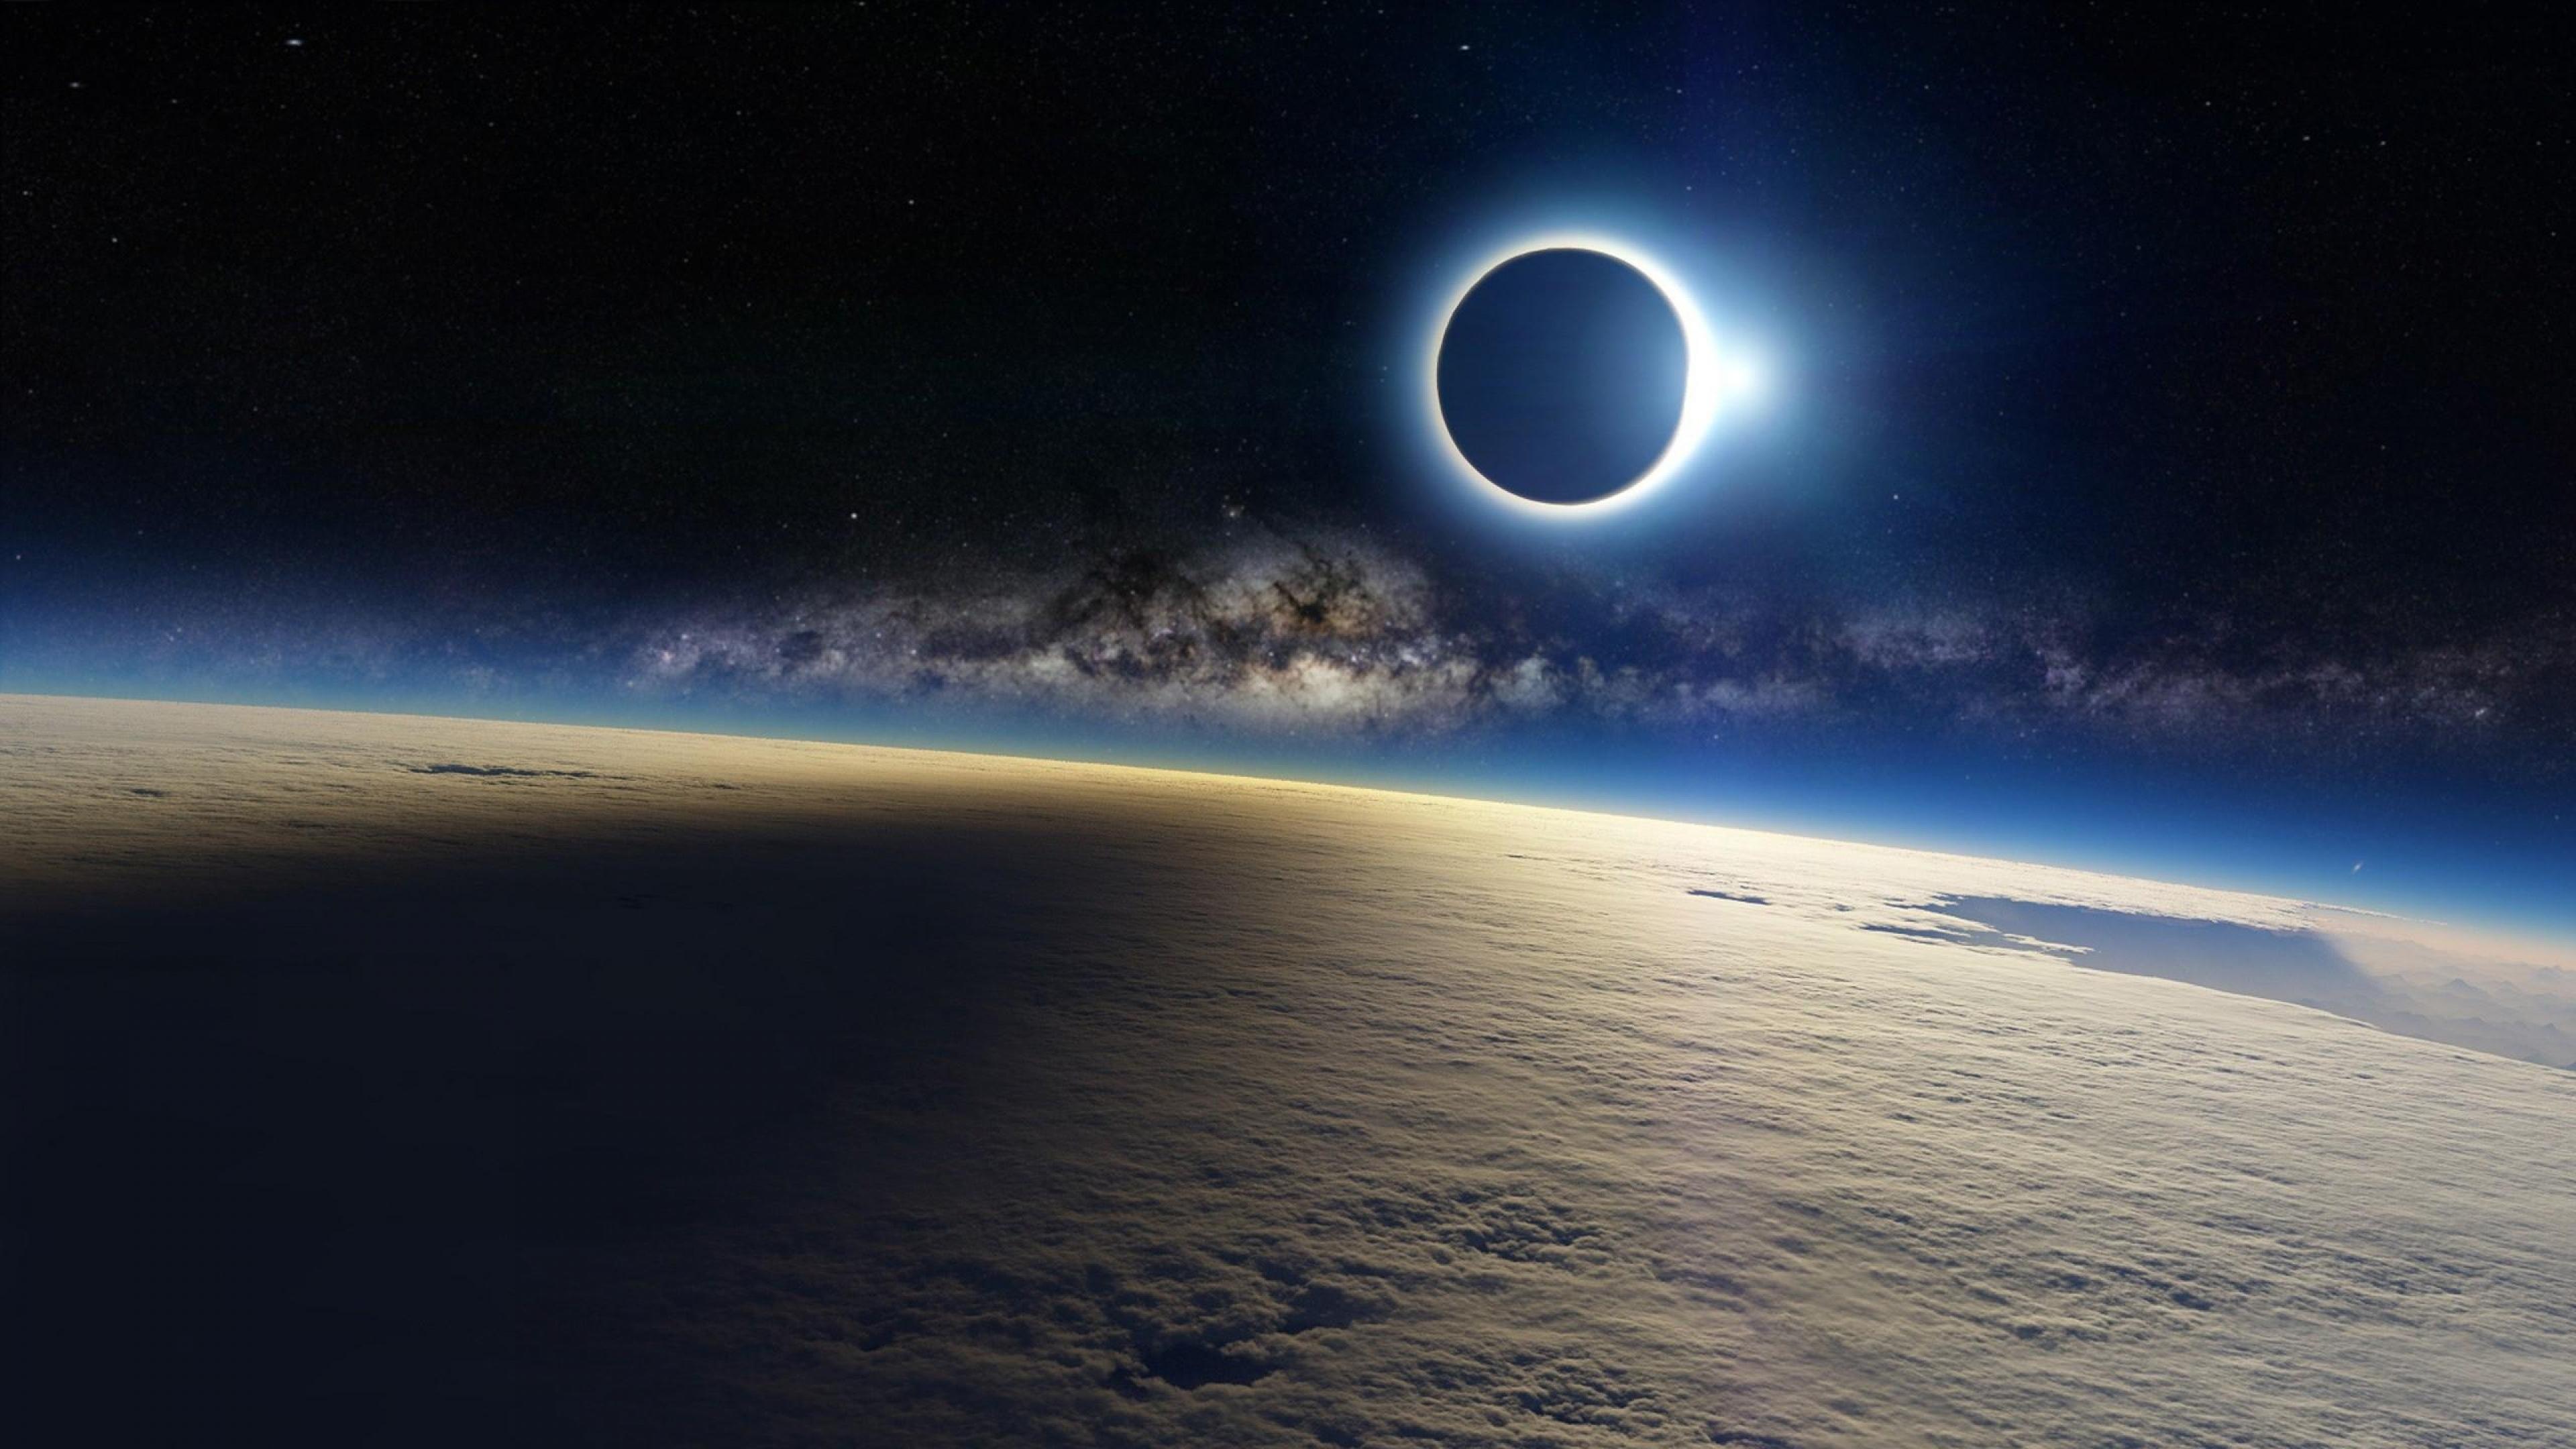 Download Wallpaper 3840x2160 clouds milky way eclipse light 4K 3840x2160